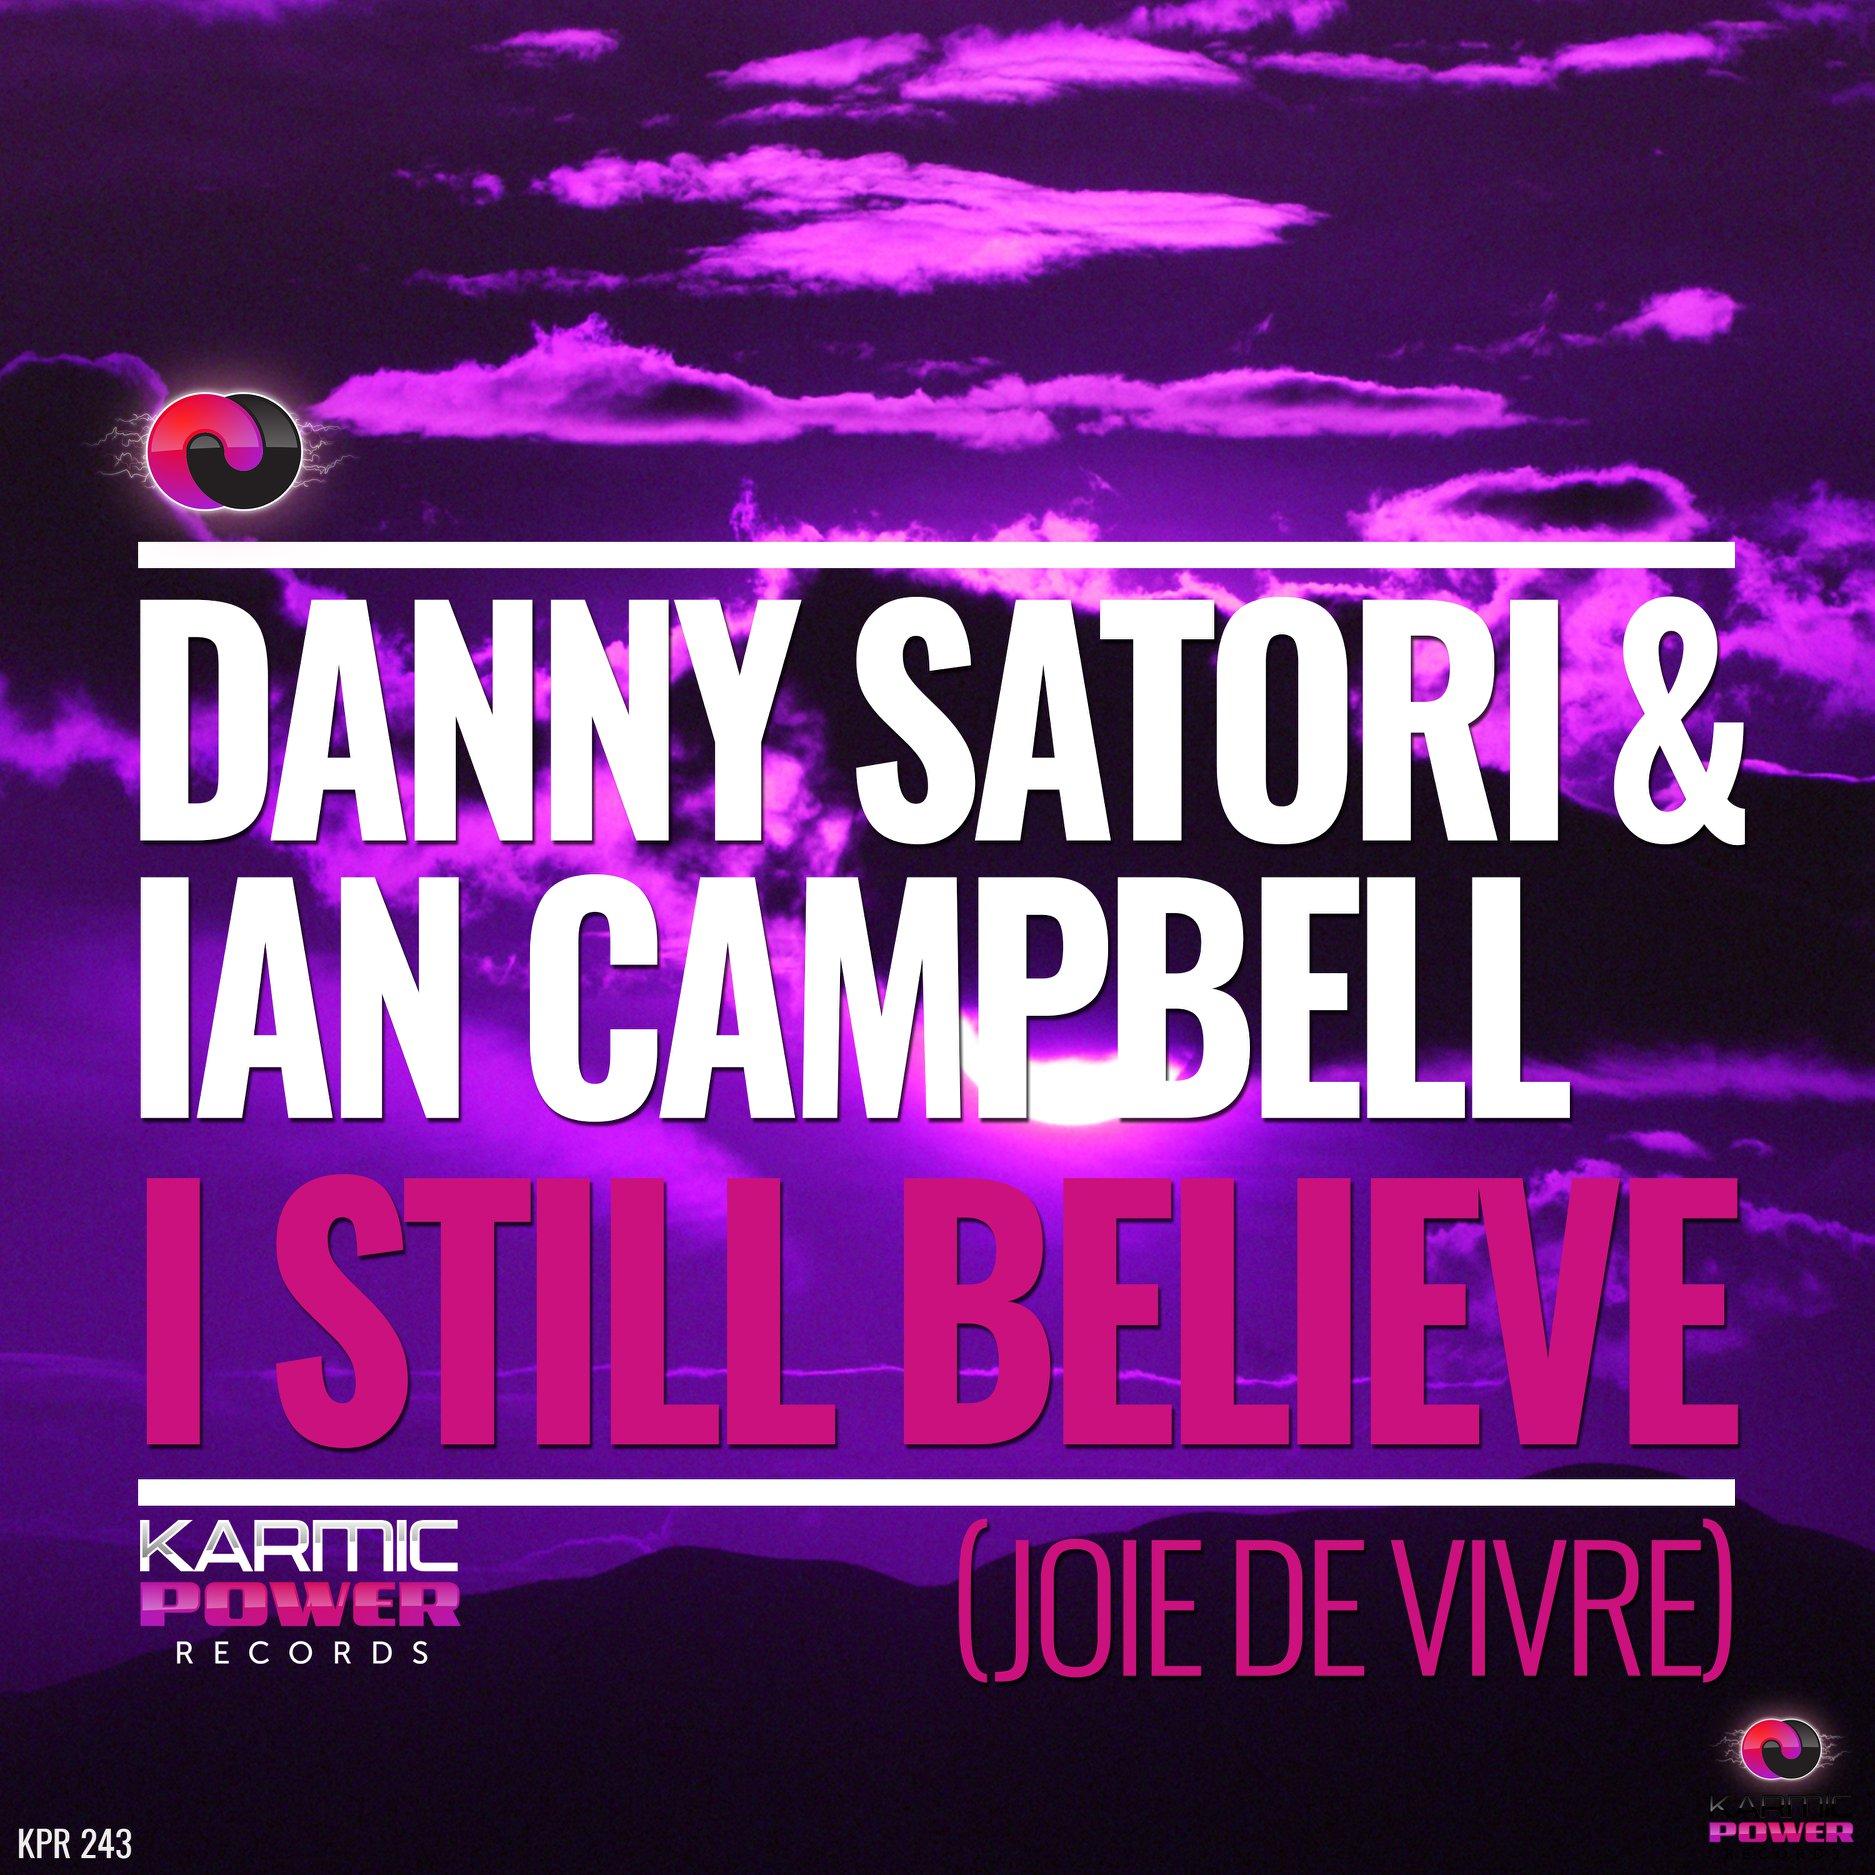 I Still Believe (Joie De Vivre)